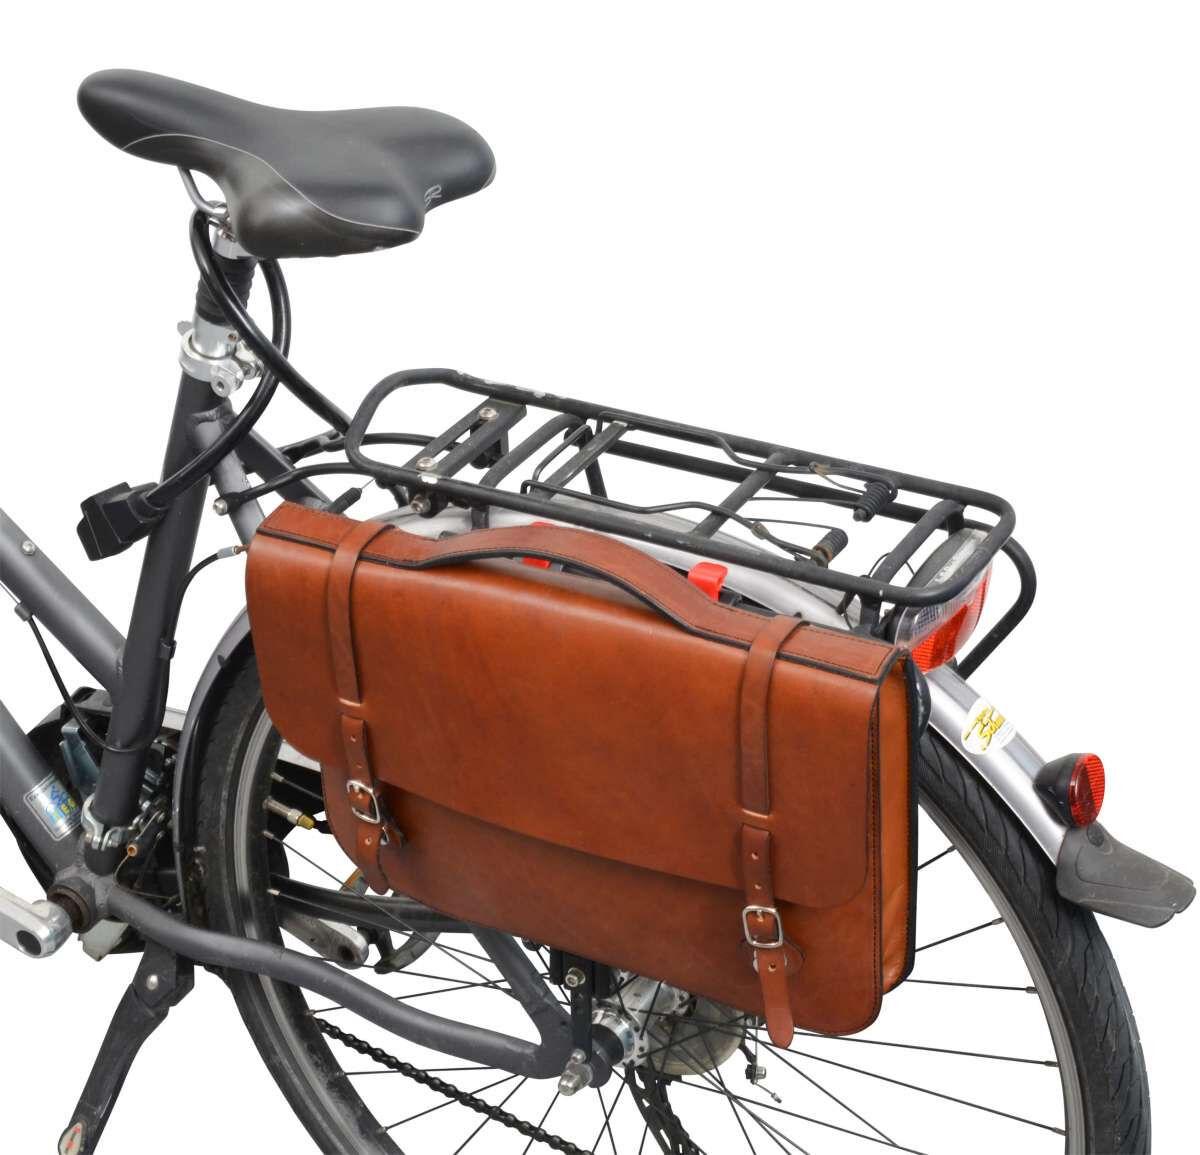 Hofsattlerei Cosack Fahrrad Aktentasche